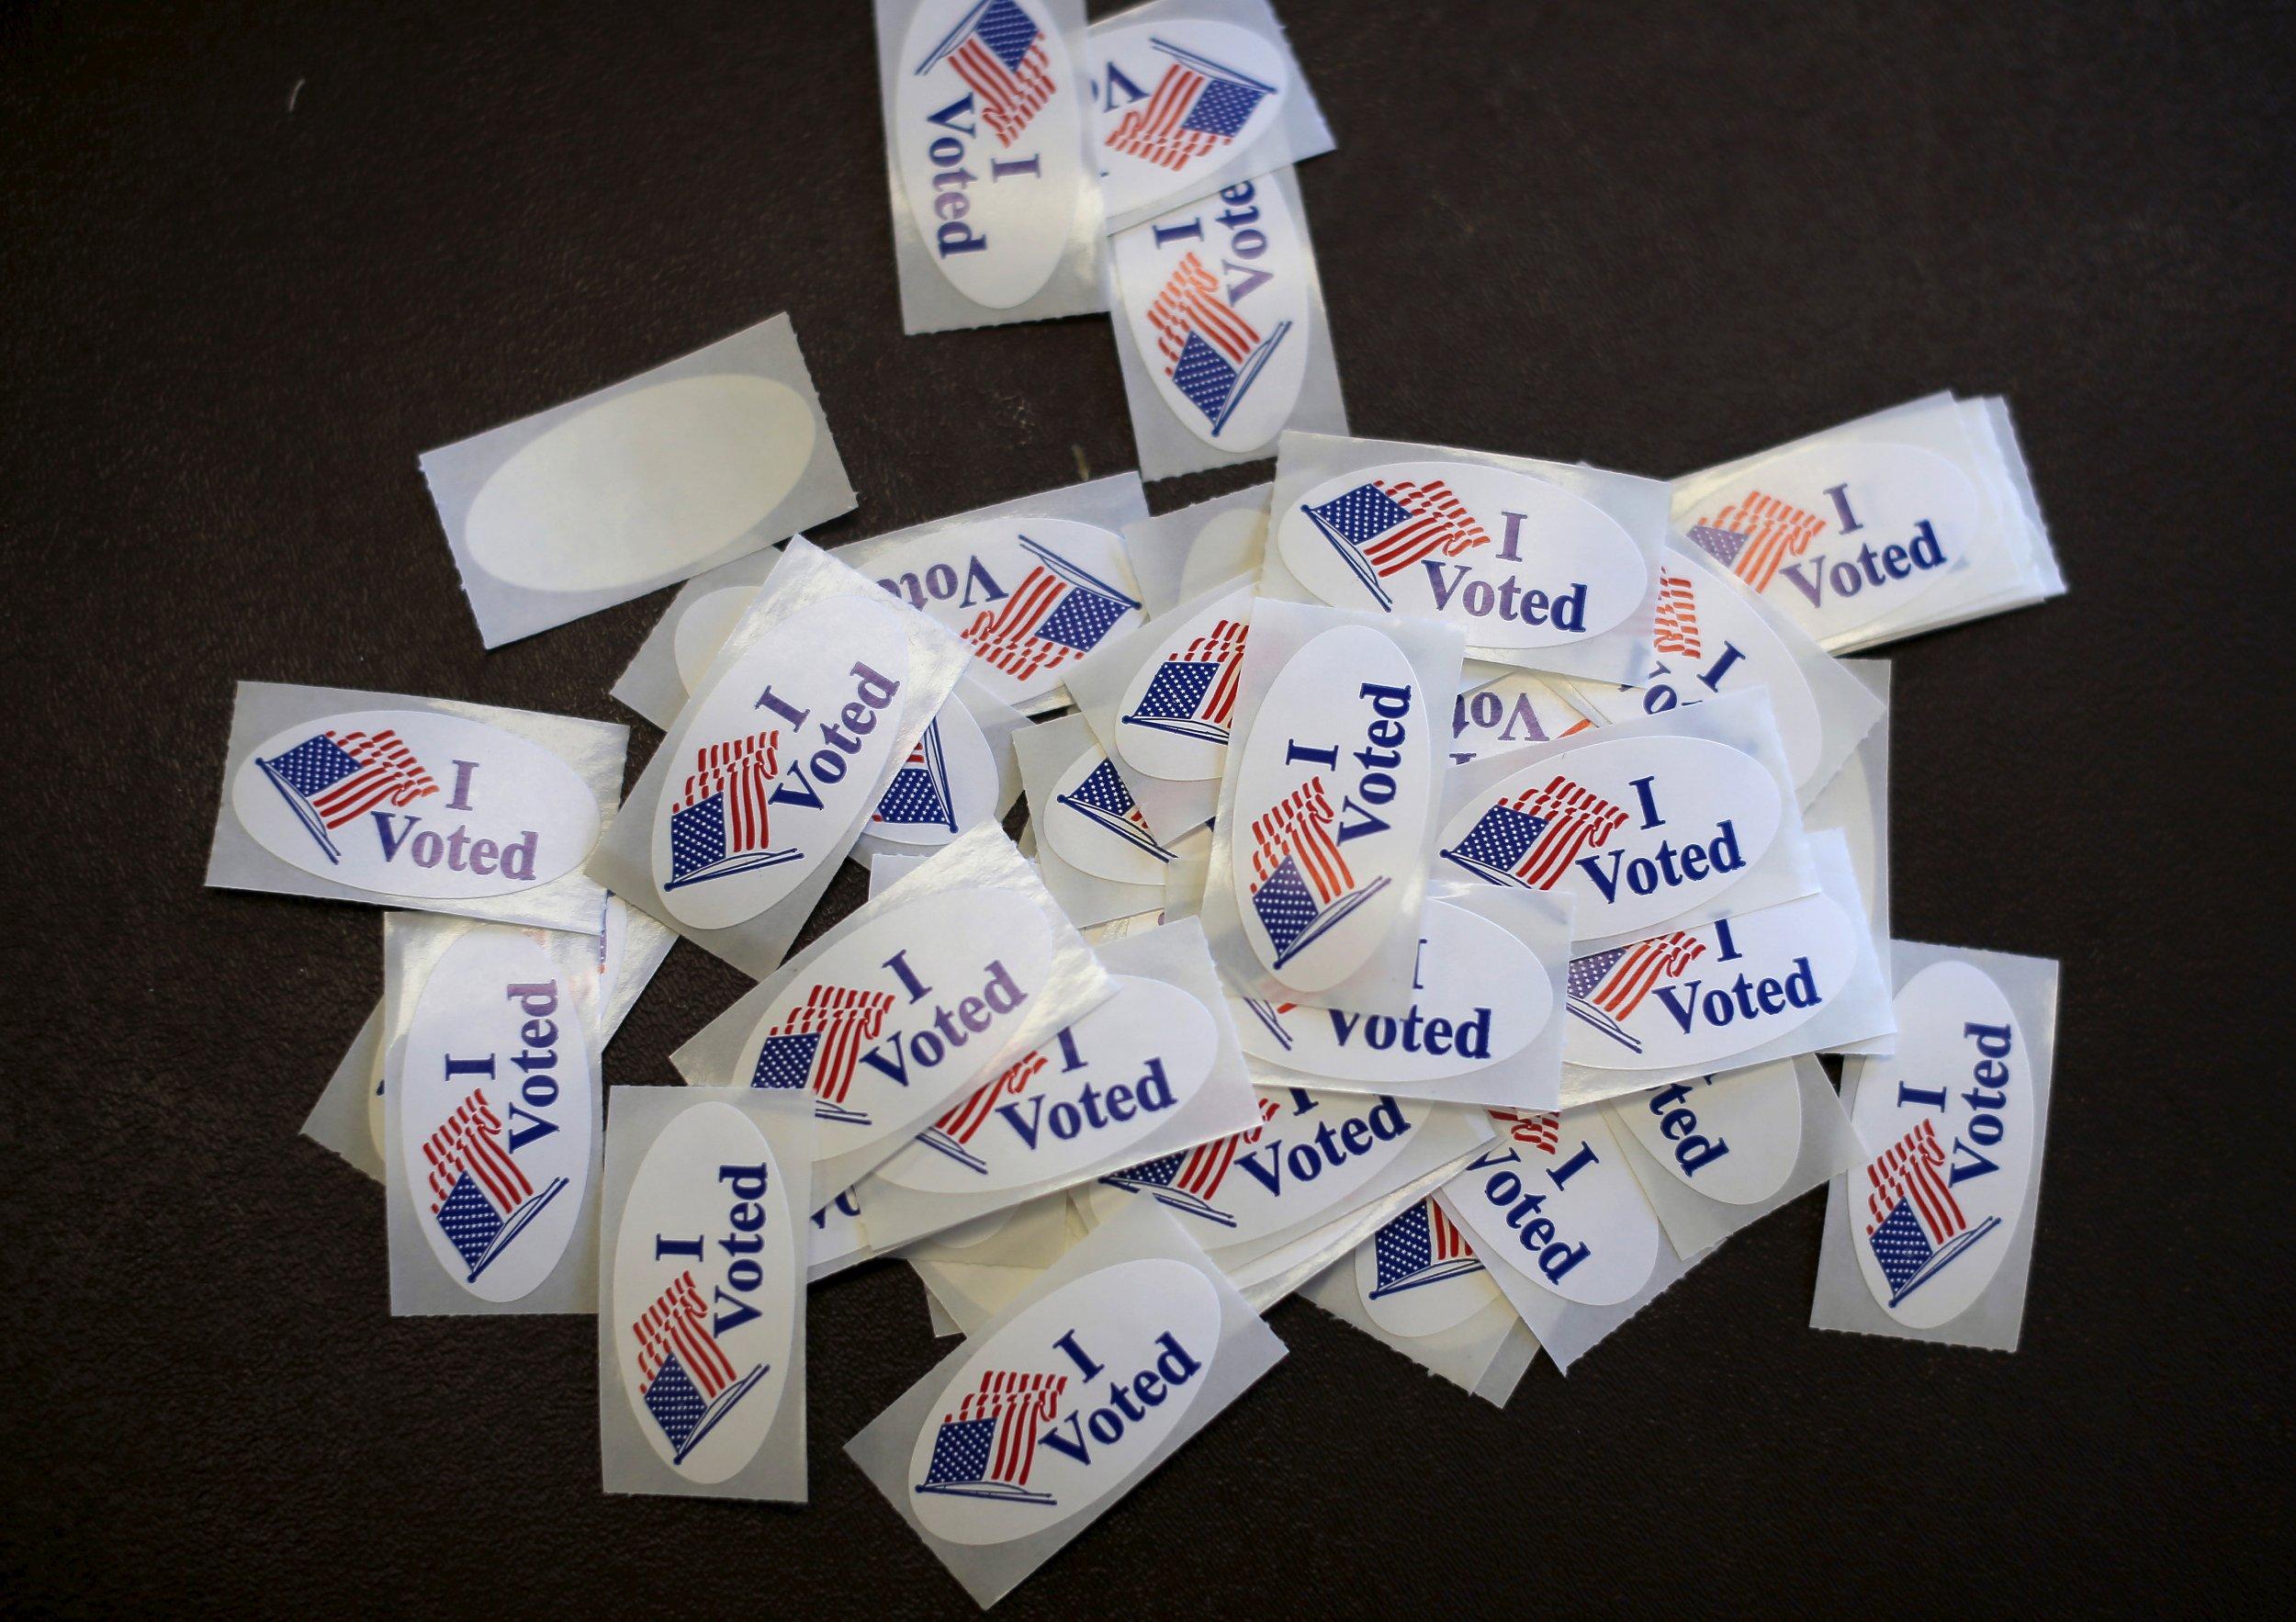 1020_Virginia_voter_registration_deadline_01